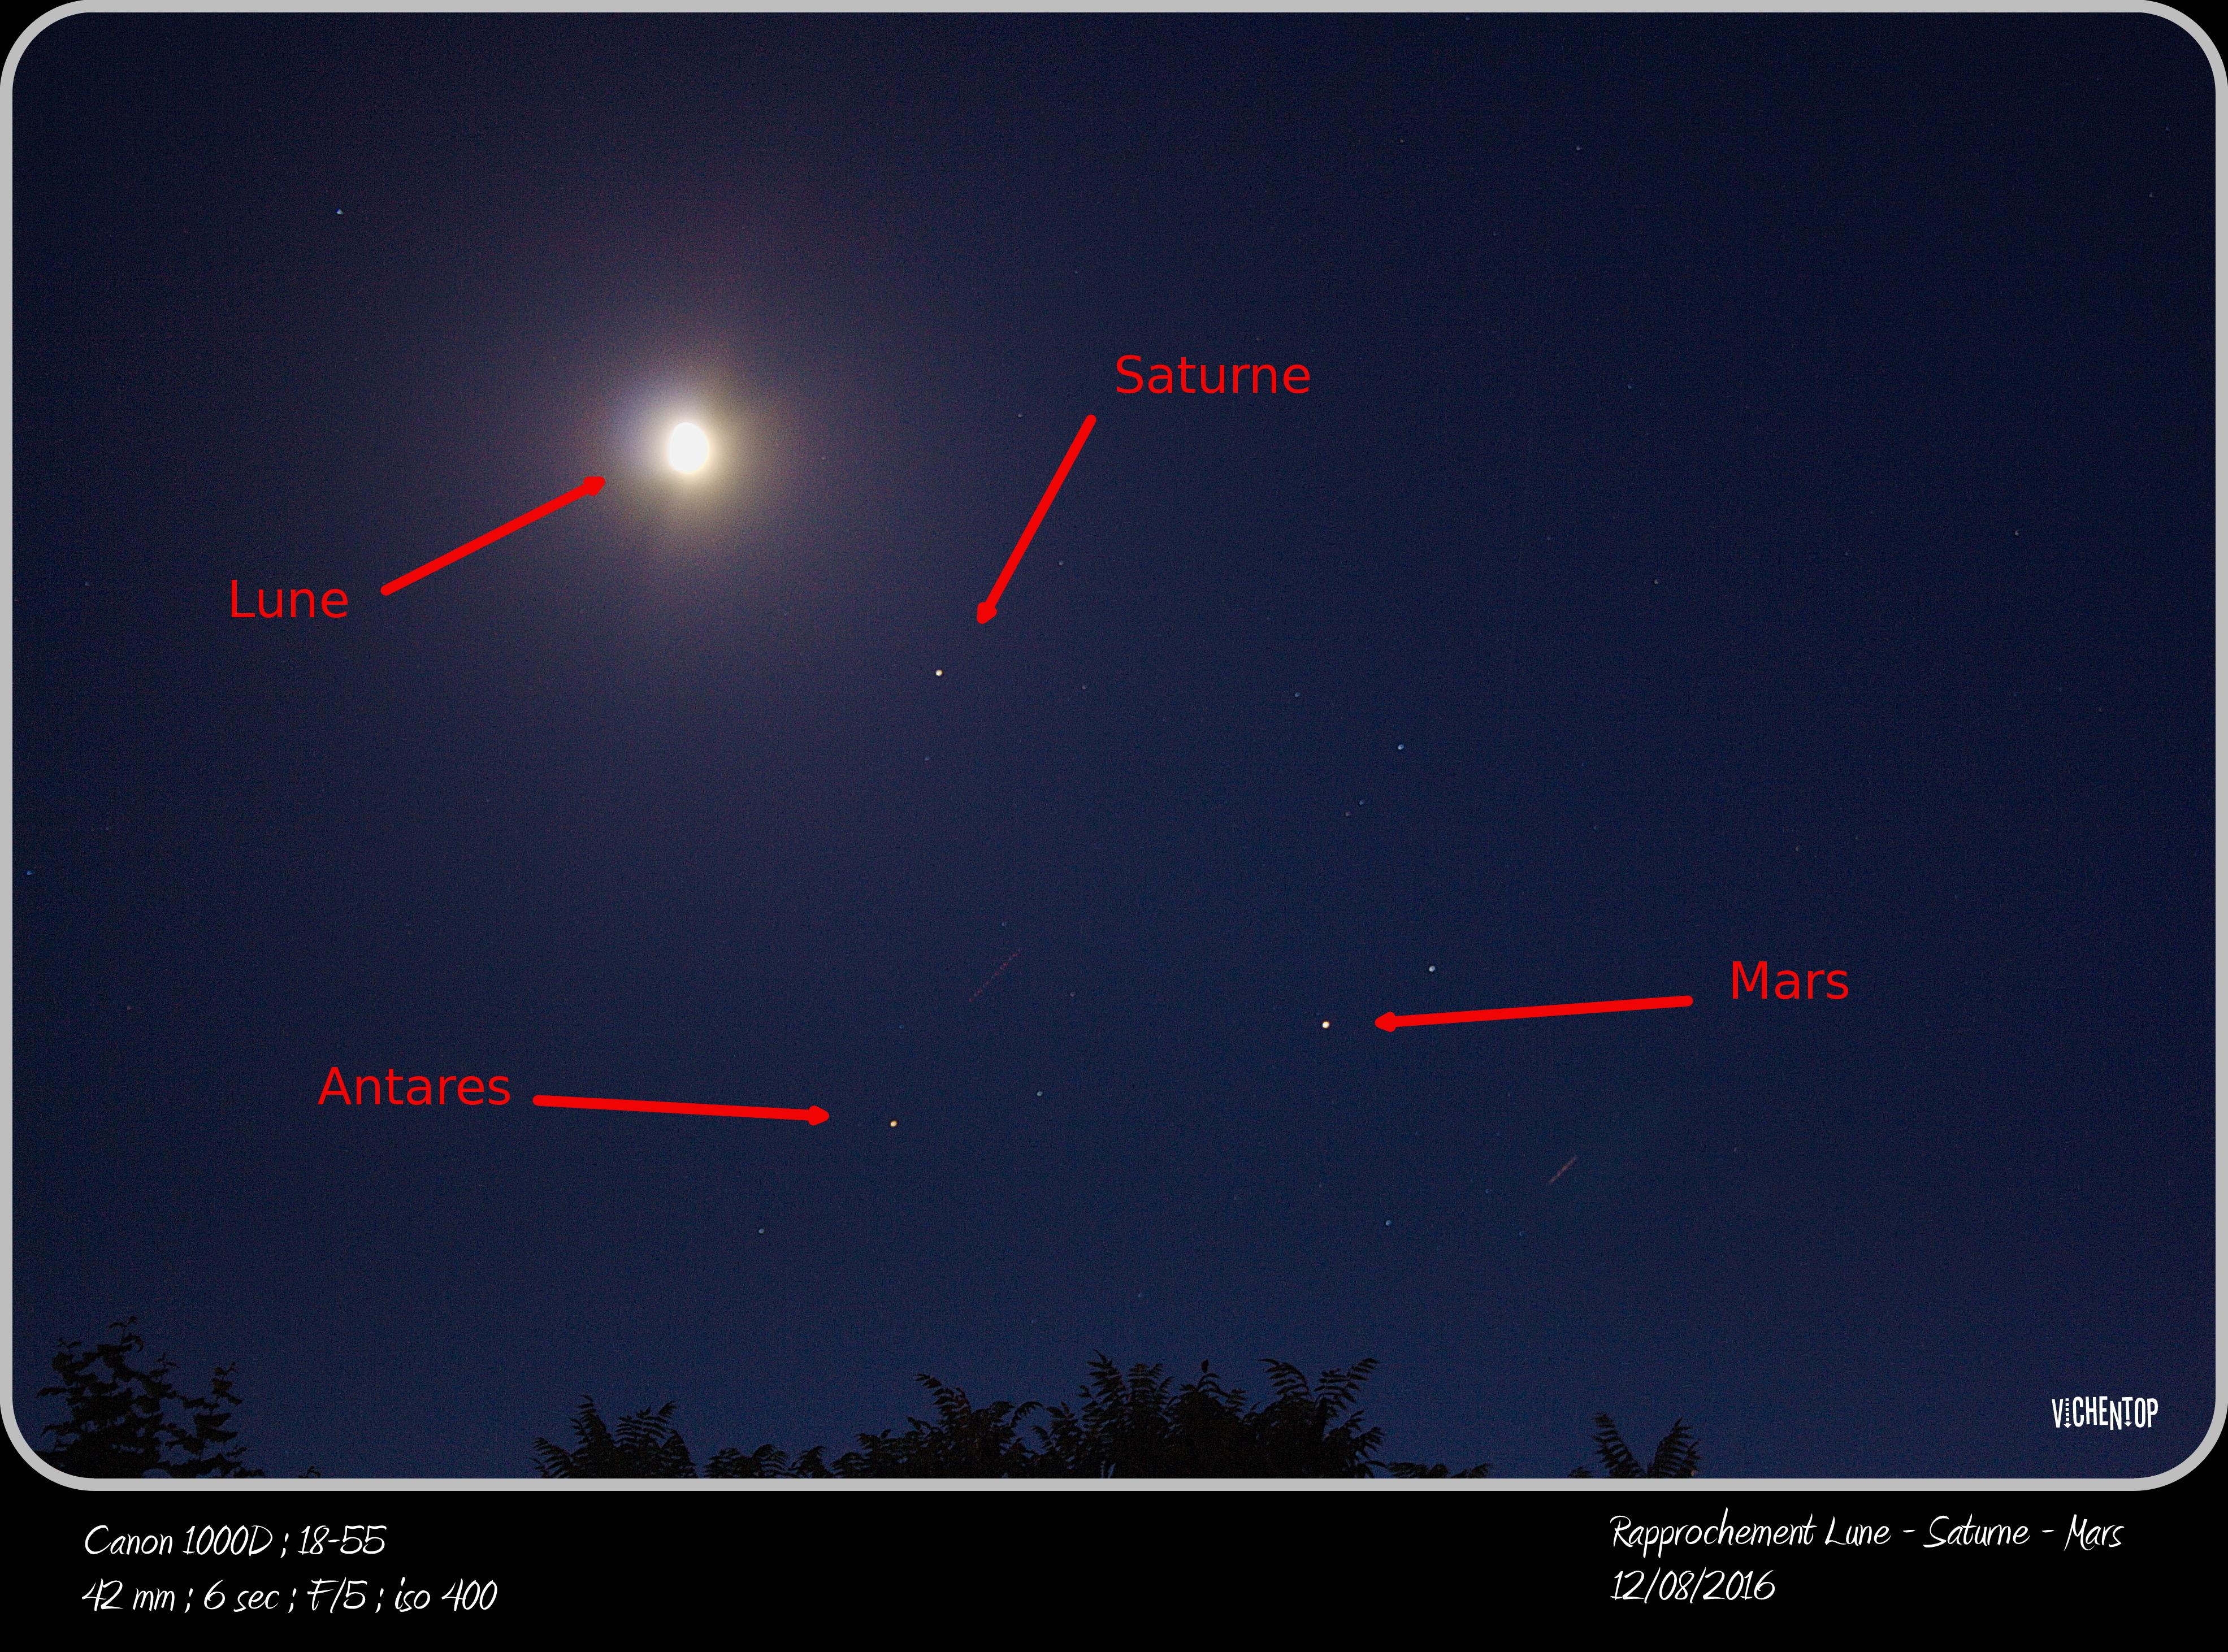 Rapprochement Lune-Saturne-Mars